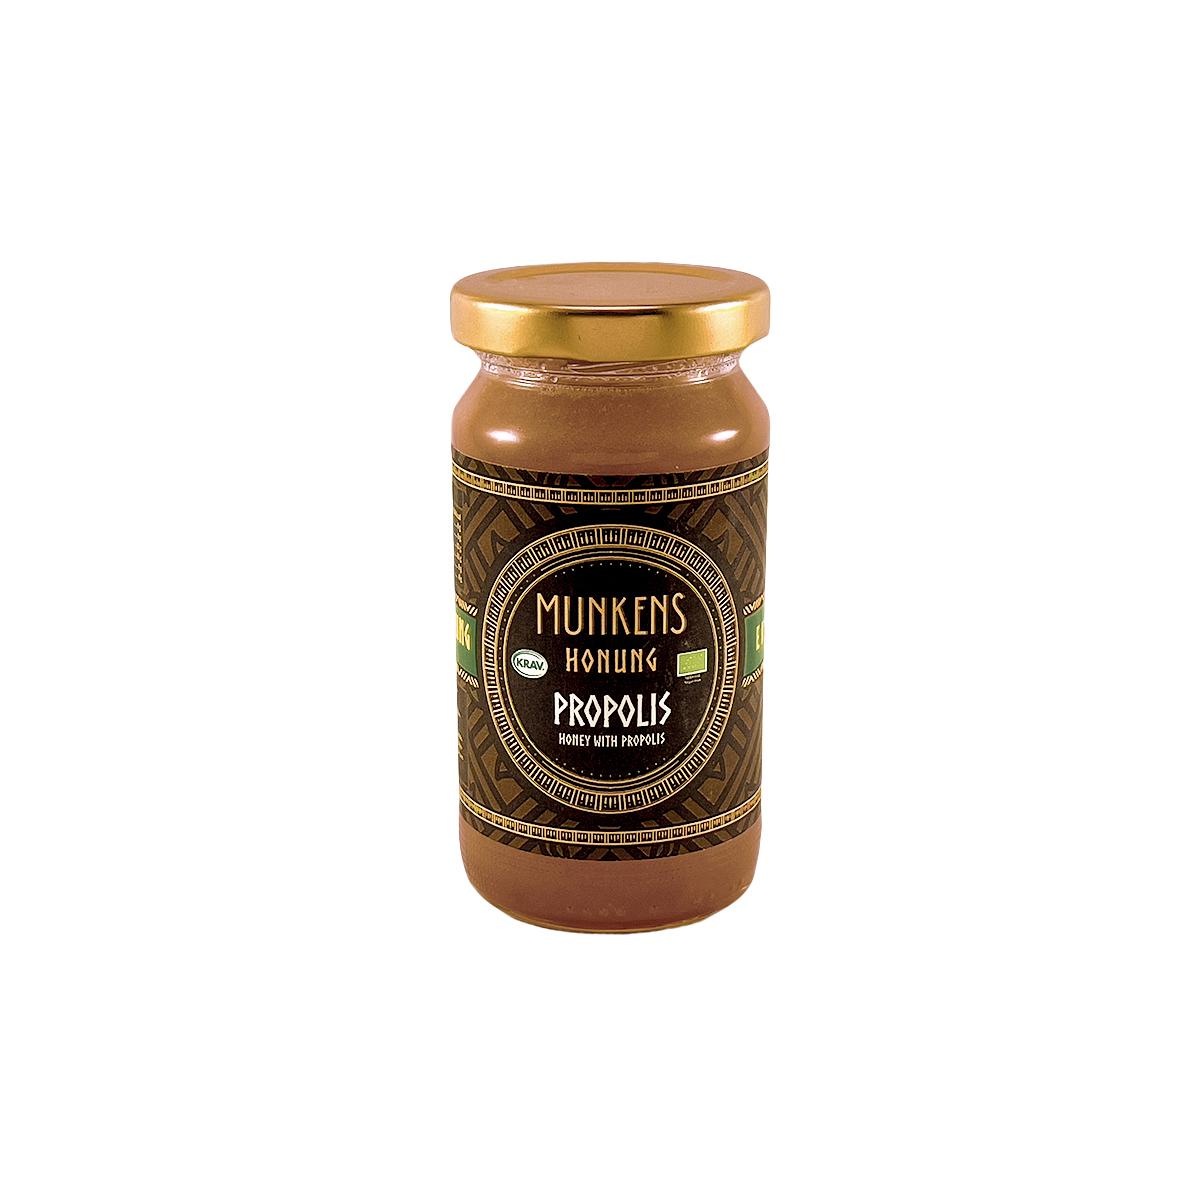 Munkens Honung – Kallrörd:Rå:Raw – Propolis